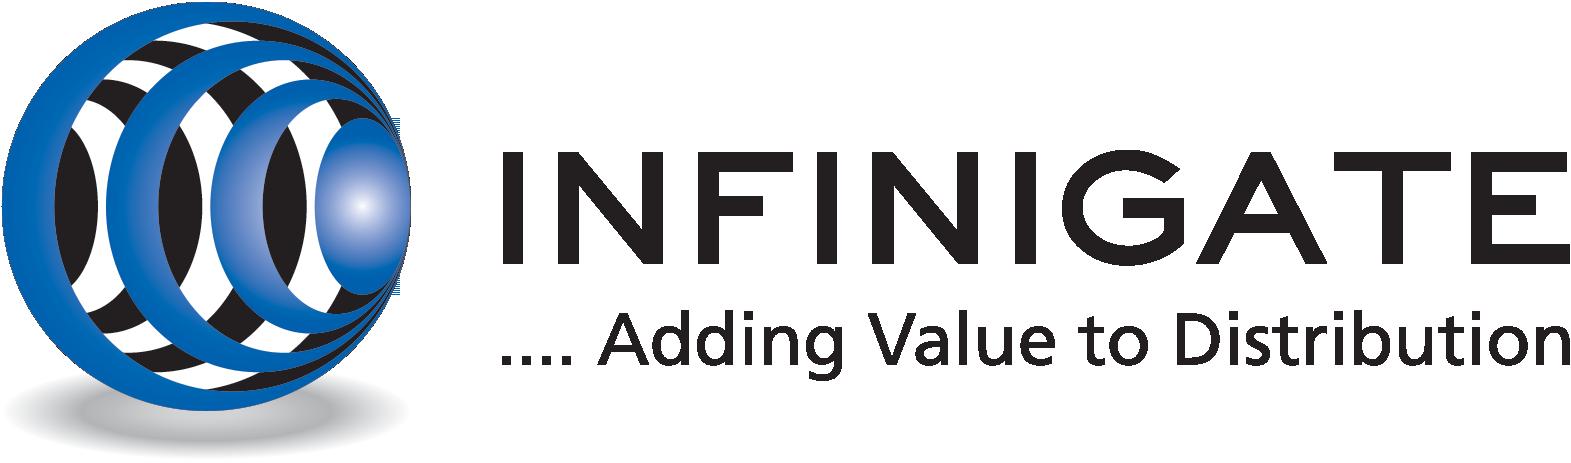 Infinigate UK Logo